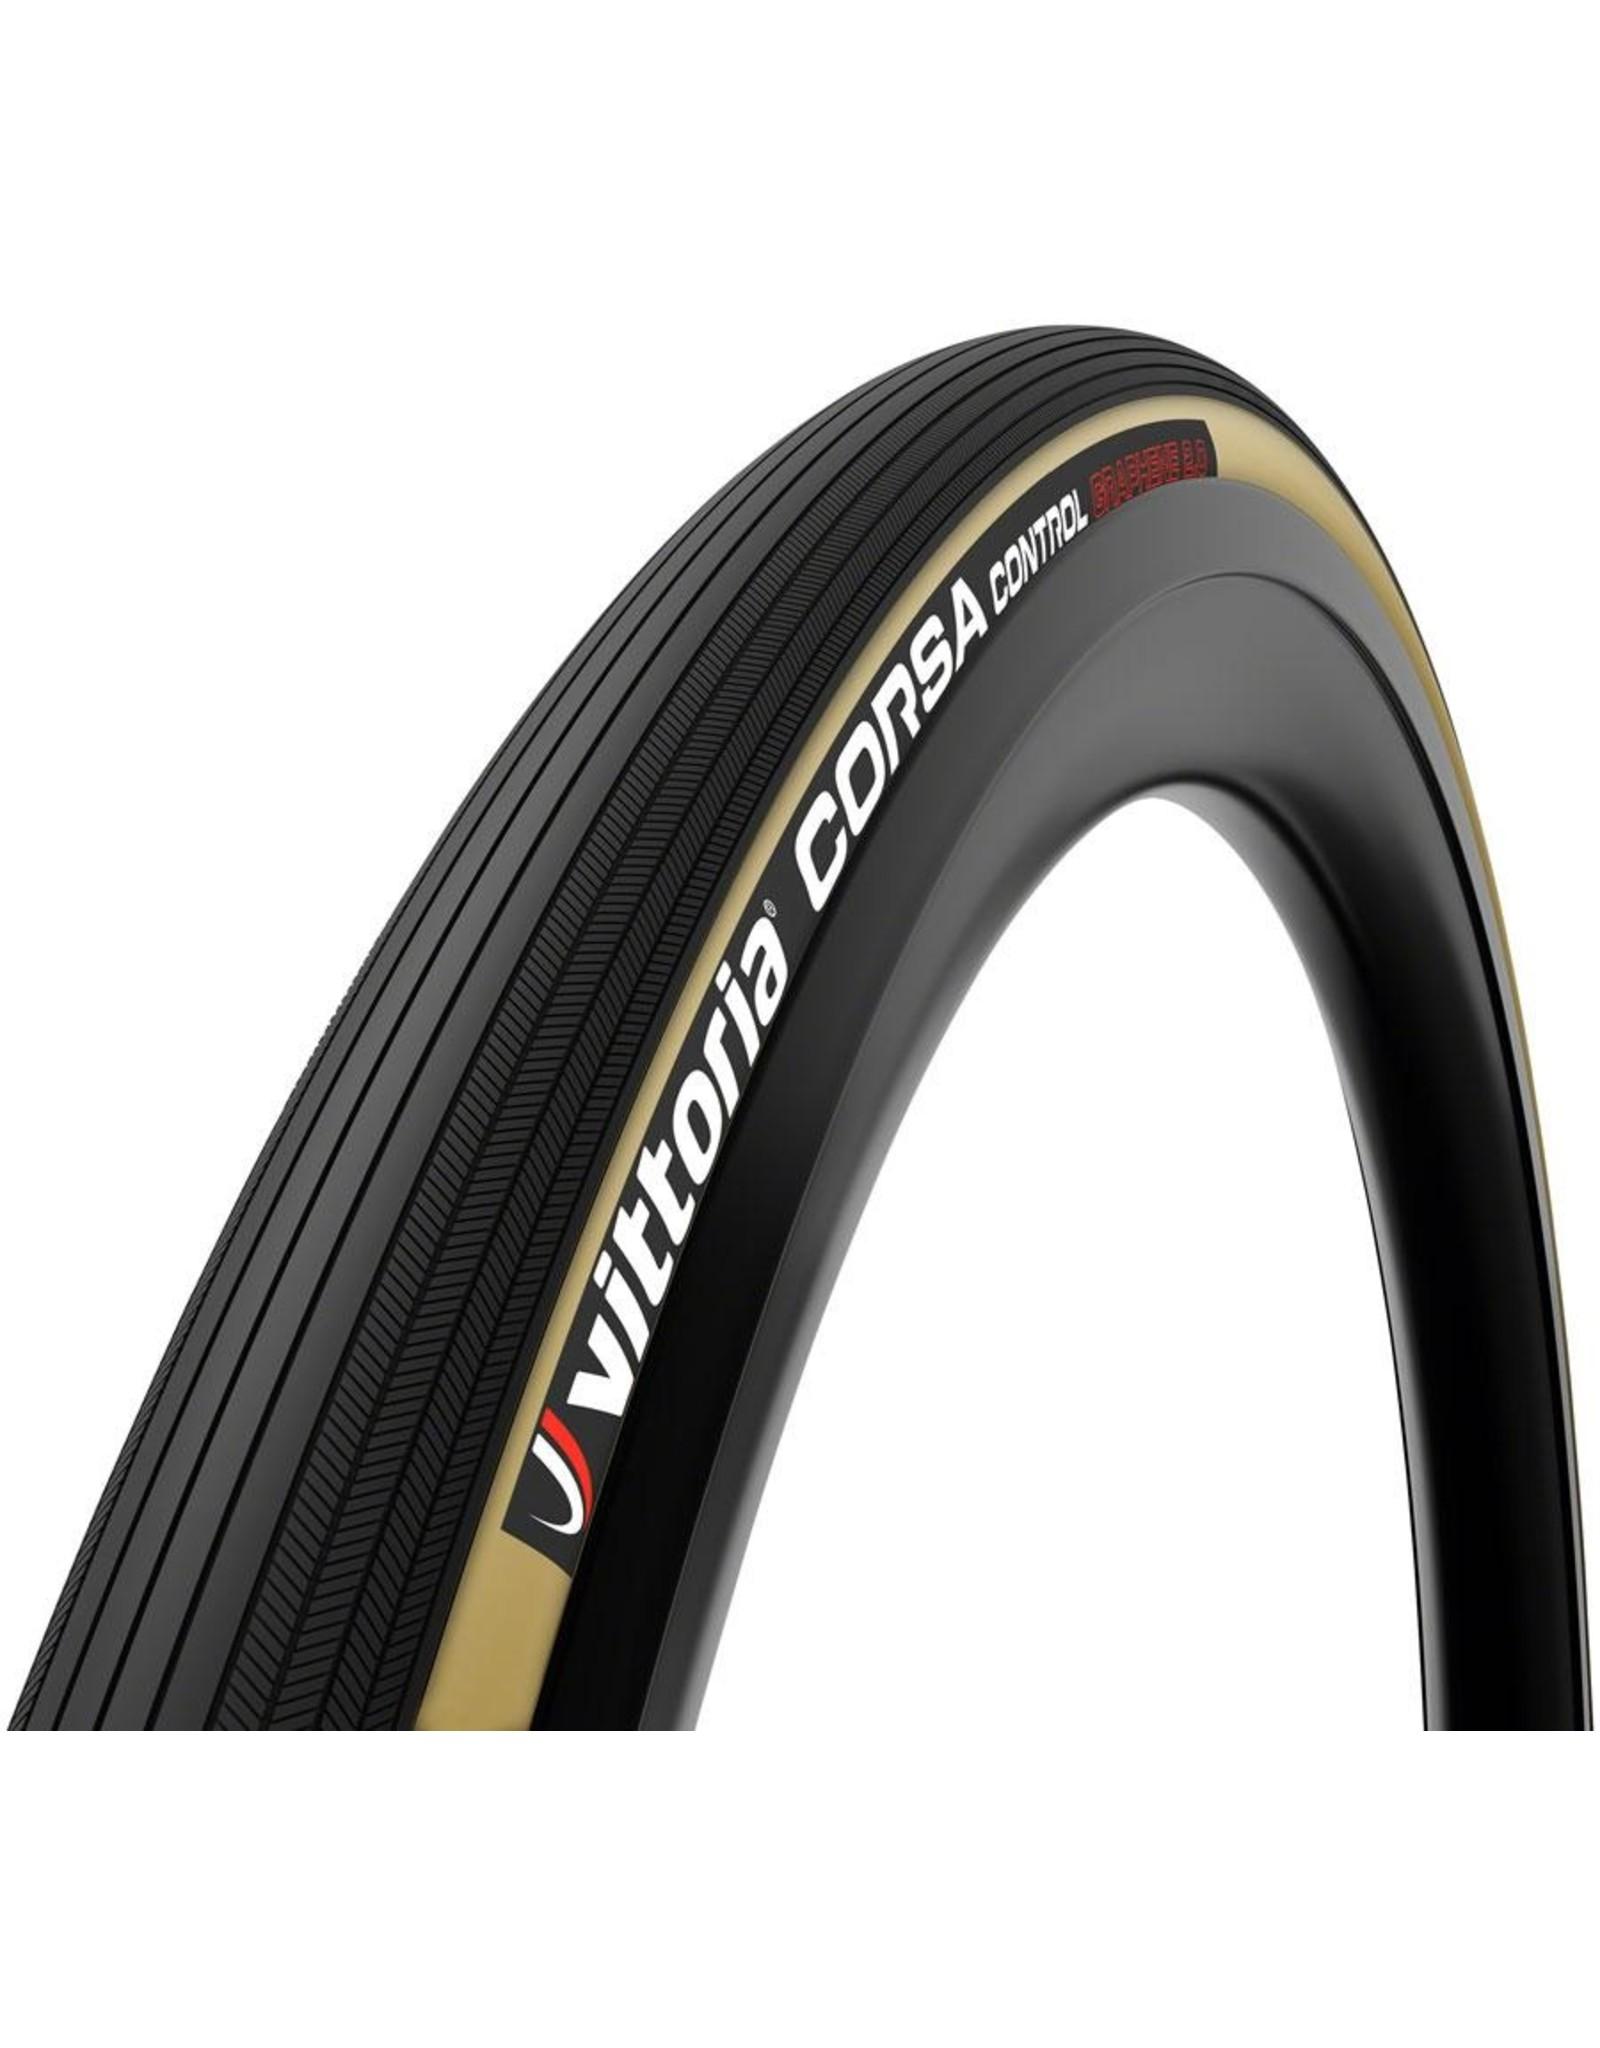 Vittoria Vittoria Corsa Control G2.0 Tire - 700 x 28, Clincher, Folding, Black/Para, 320tpi